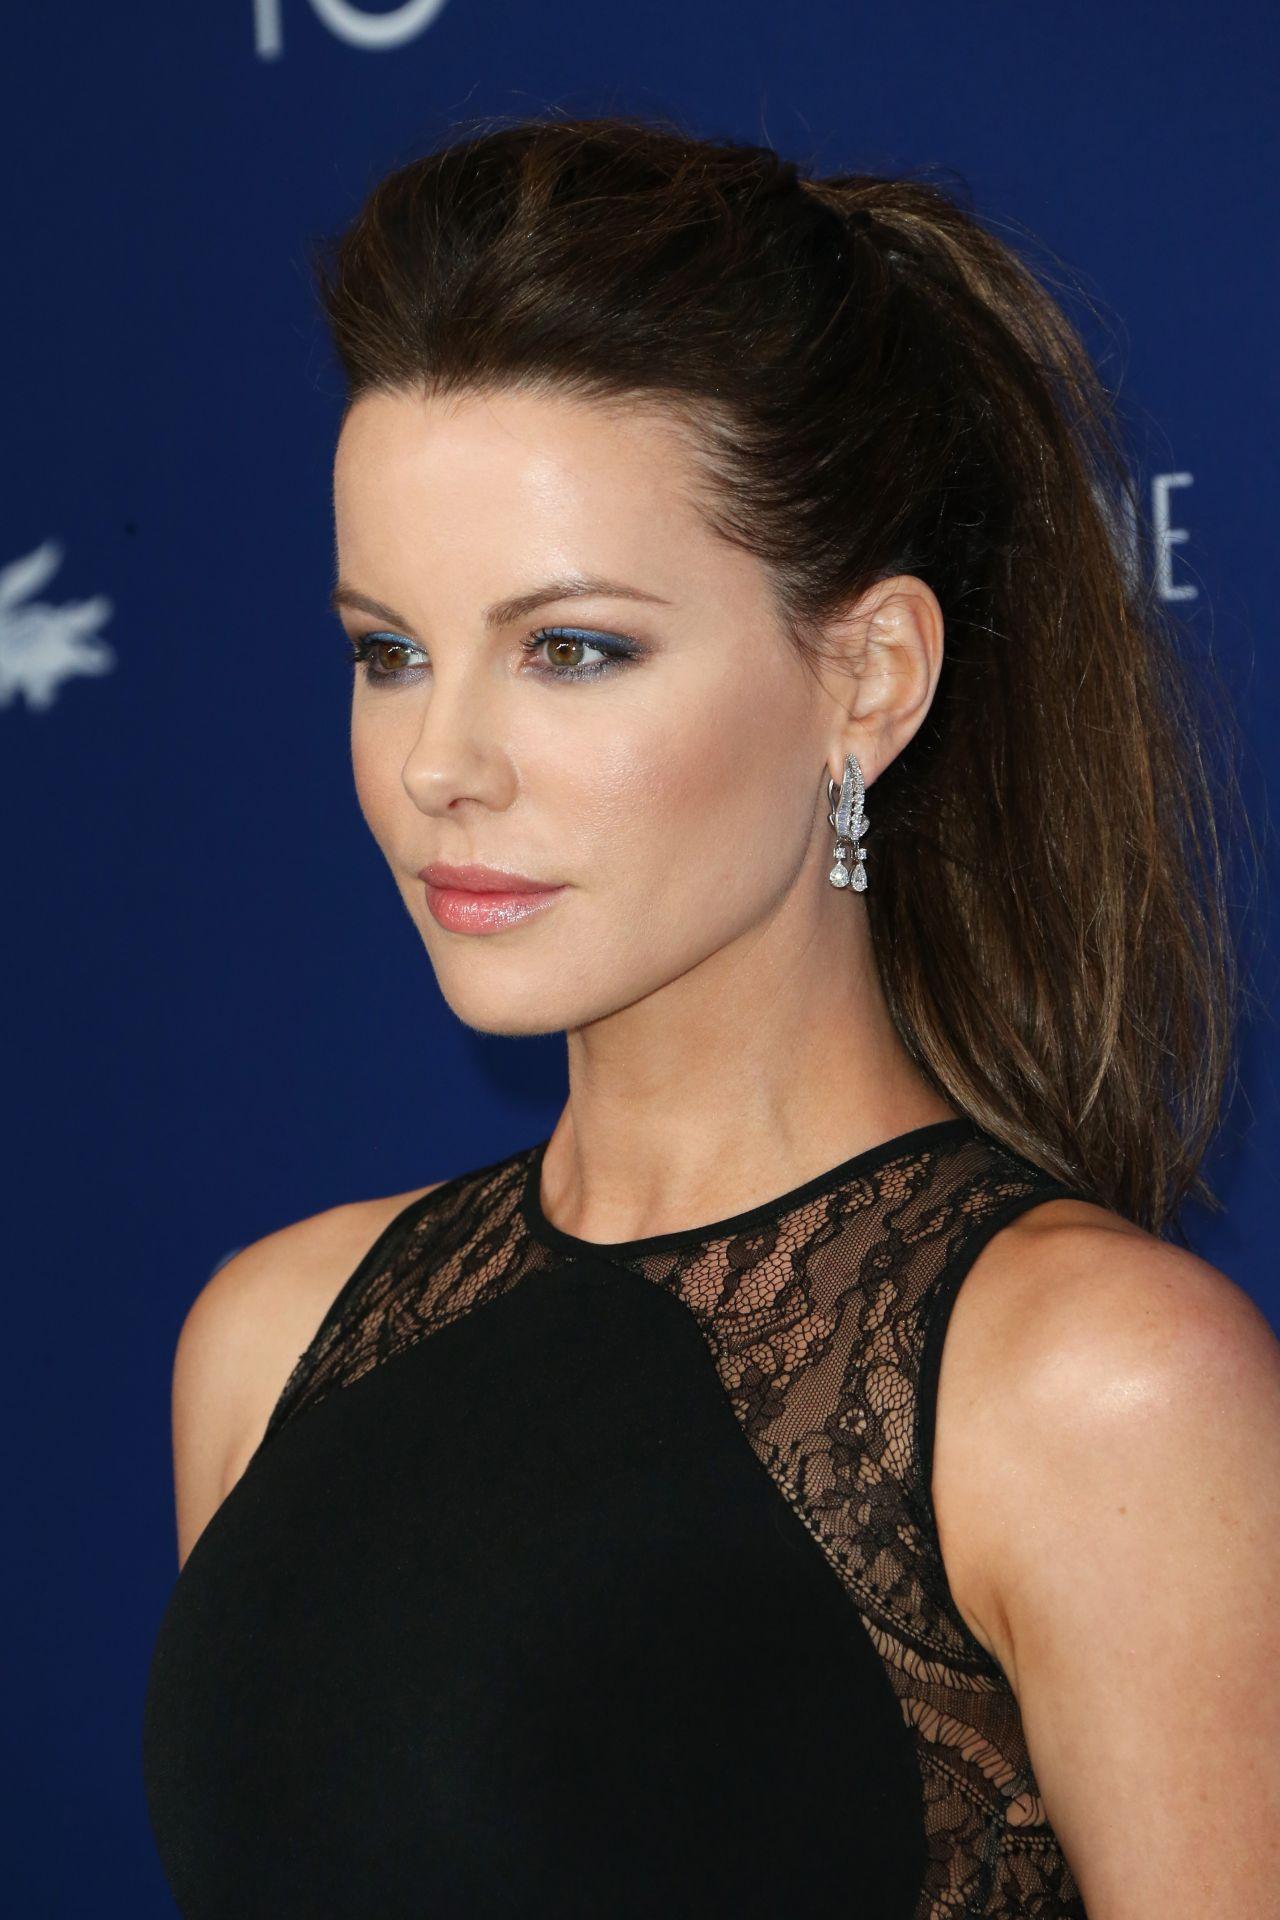 Kate Beckinsale Hot & Sexy Bikini Photos, Pictures